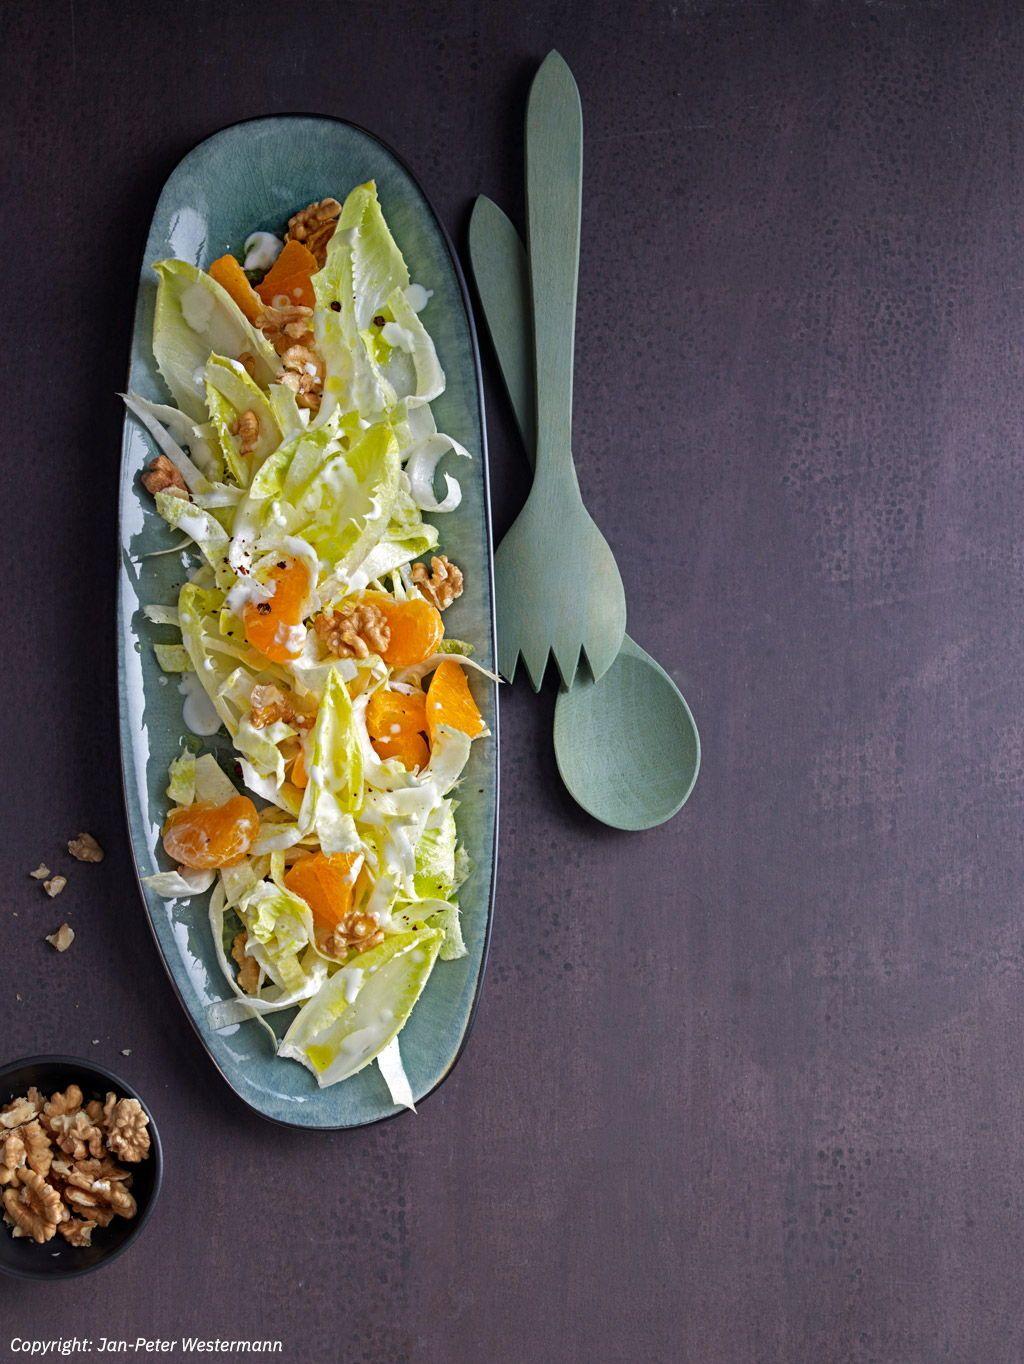 Chicoree-Nuss-Salat #applecrisp